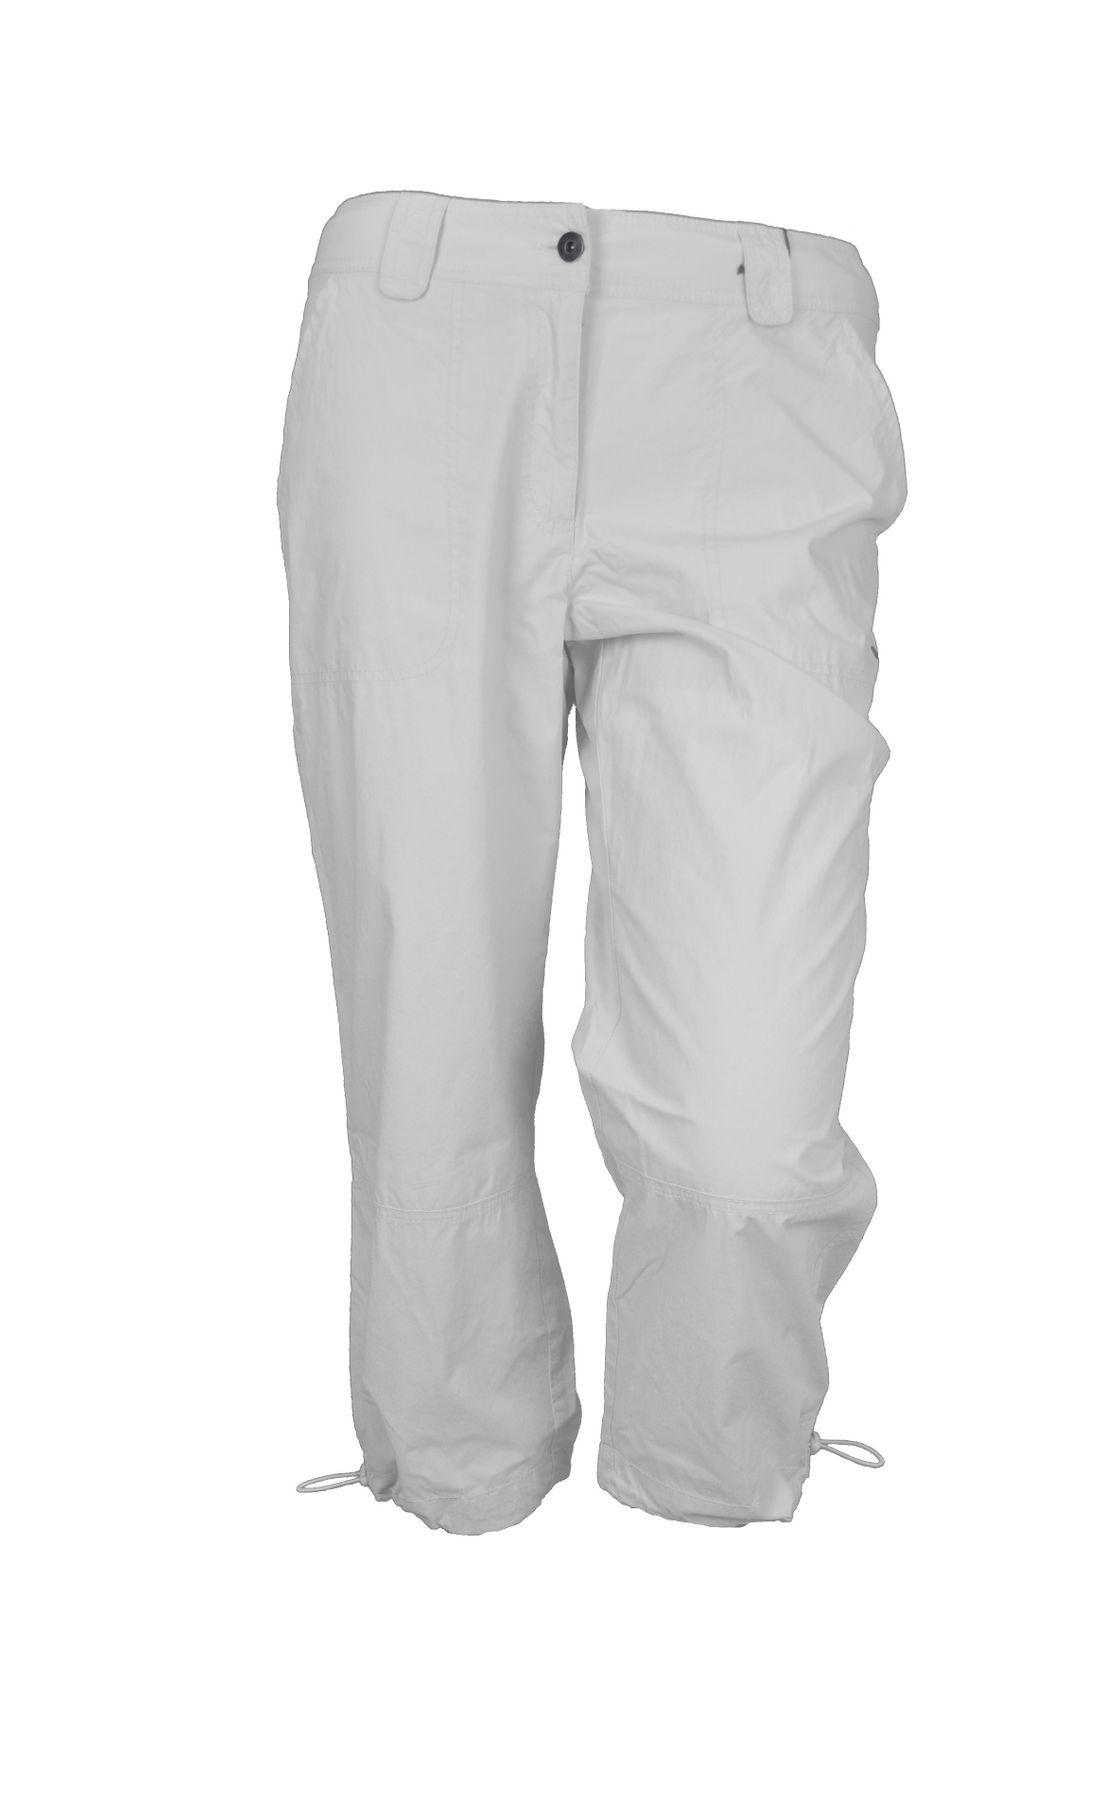 Damen 7/8 Hose in Weiß, Art. Bora(887-10)